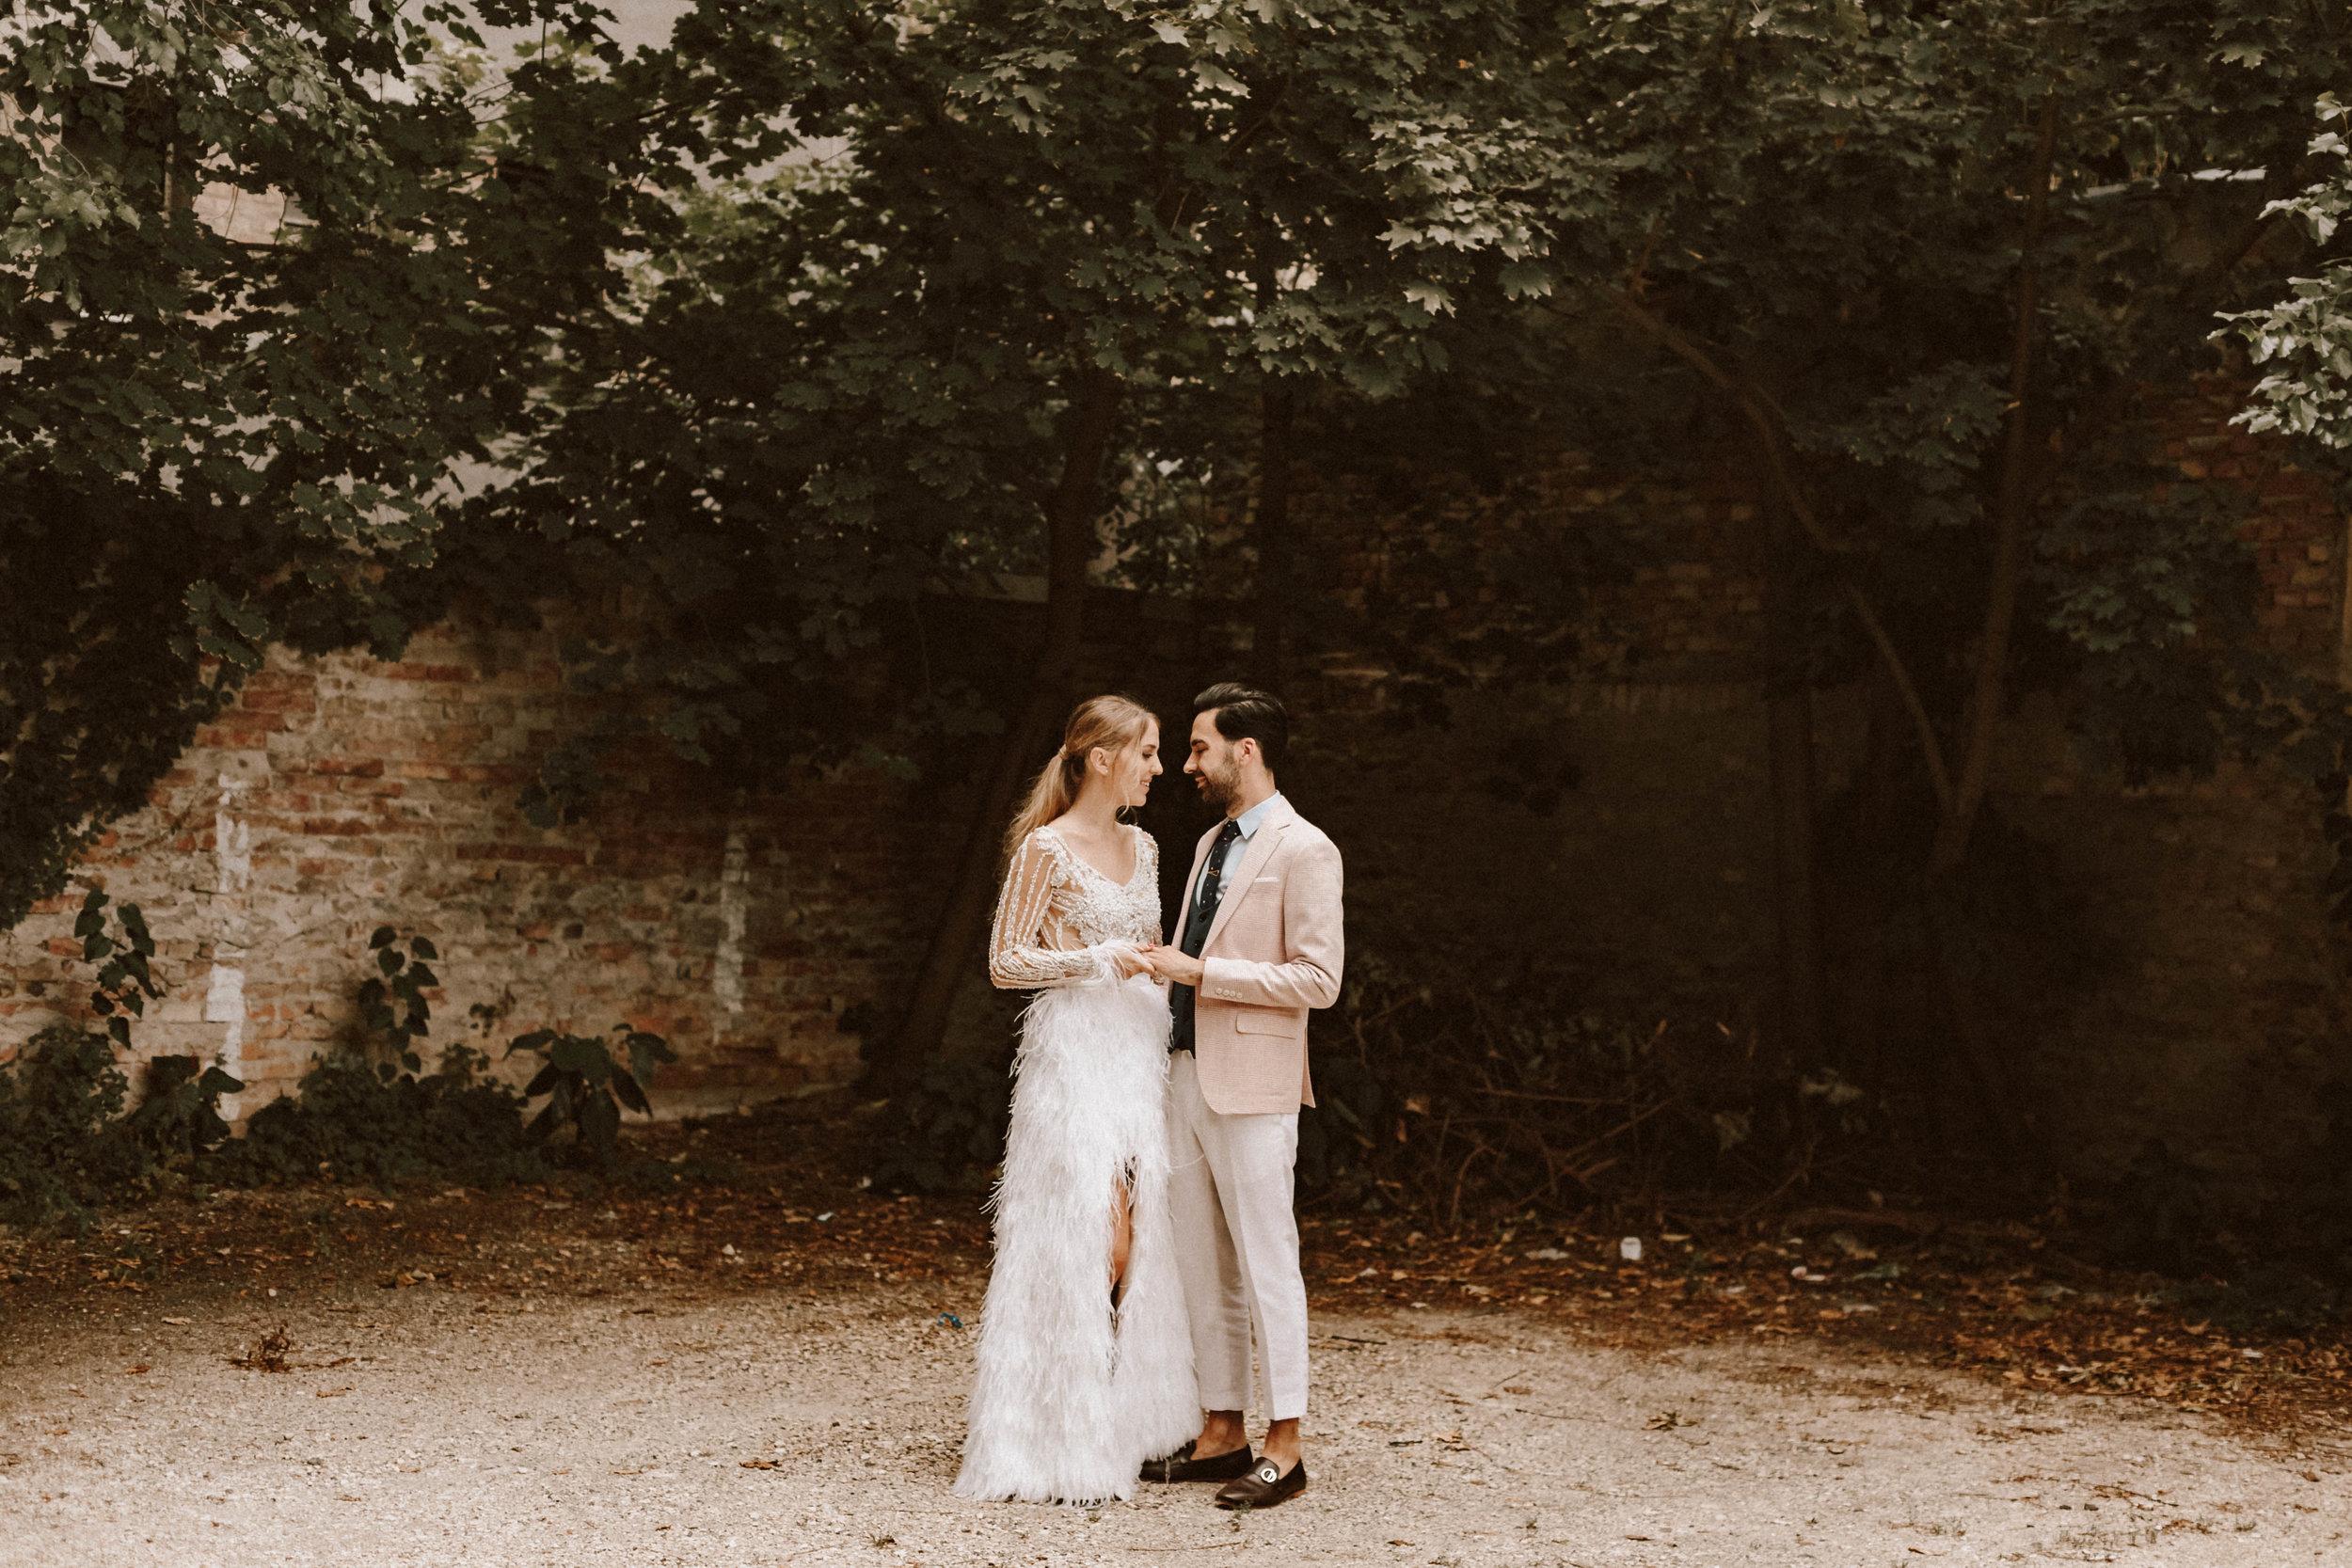 1819-Evelin+Peti-wedding-042-w.jpg